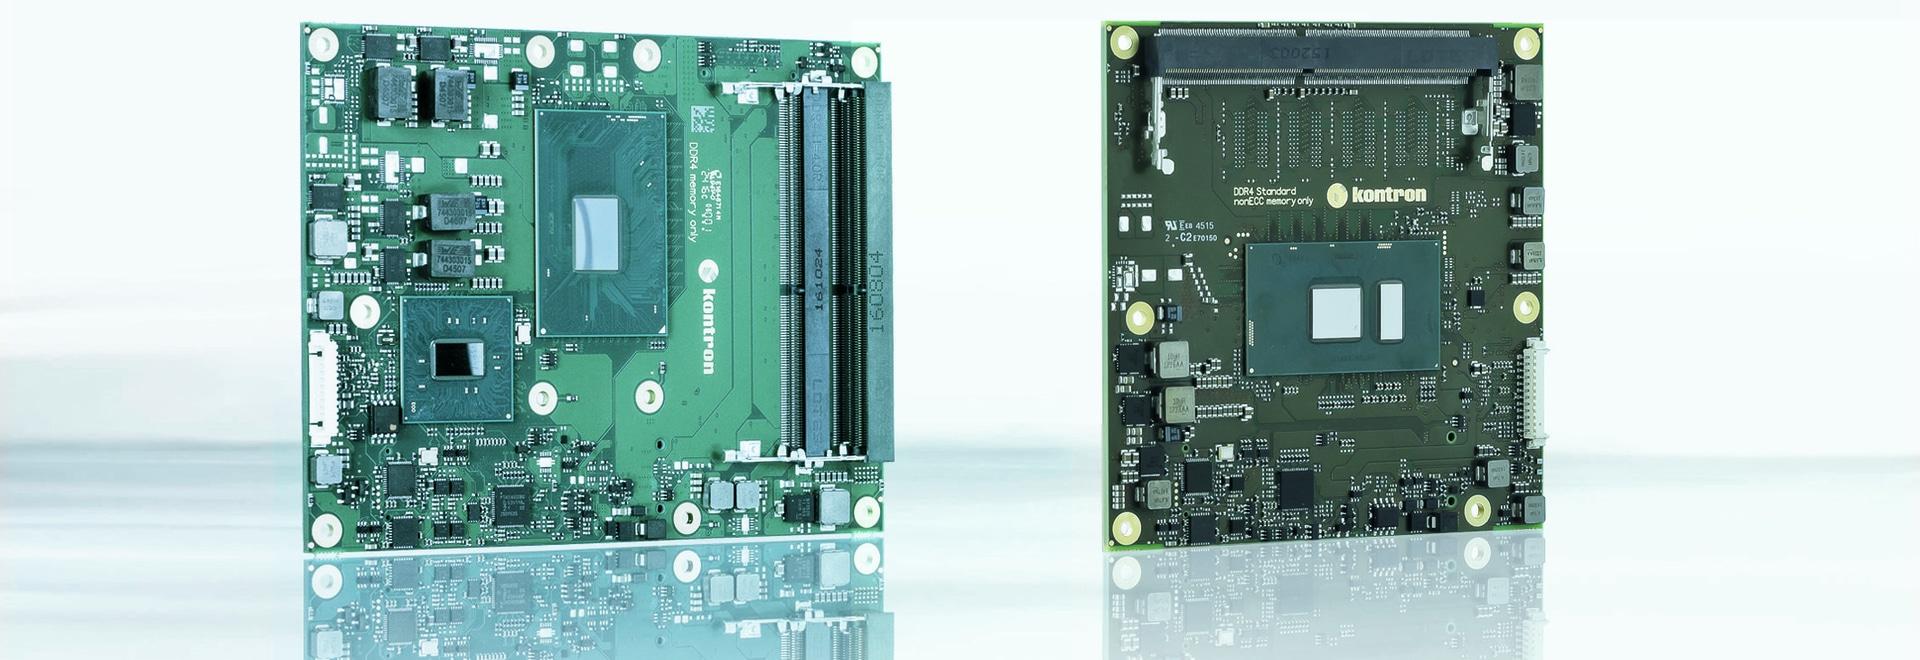 New Kontron COM Express Modules Featuring Latest Generation Intel® Processors